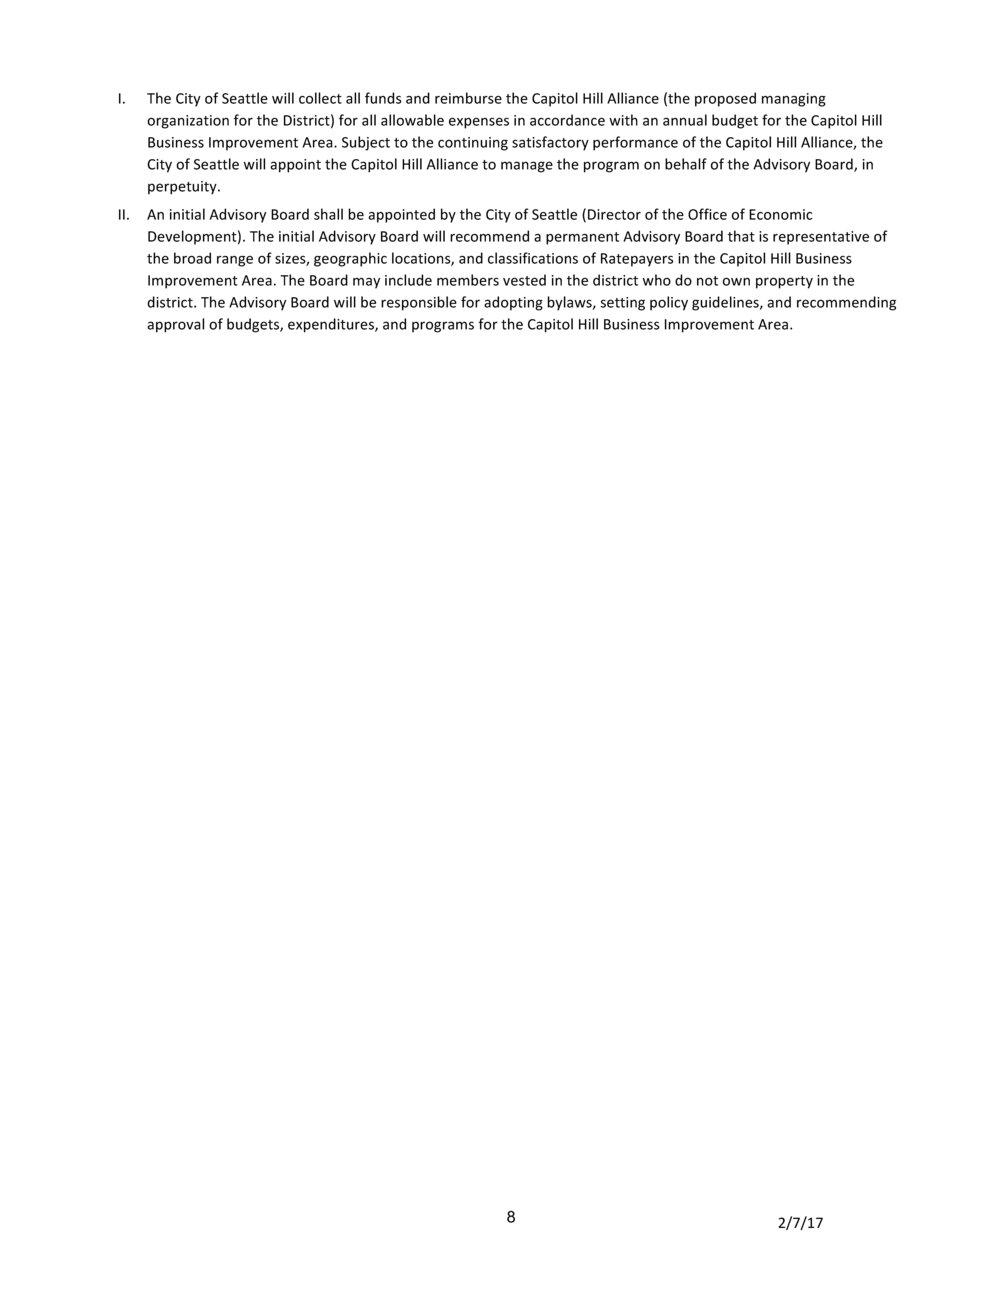 CHBIA-PetitionBody-20170207-v11_Page_8.jpg